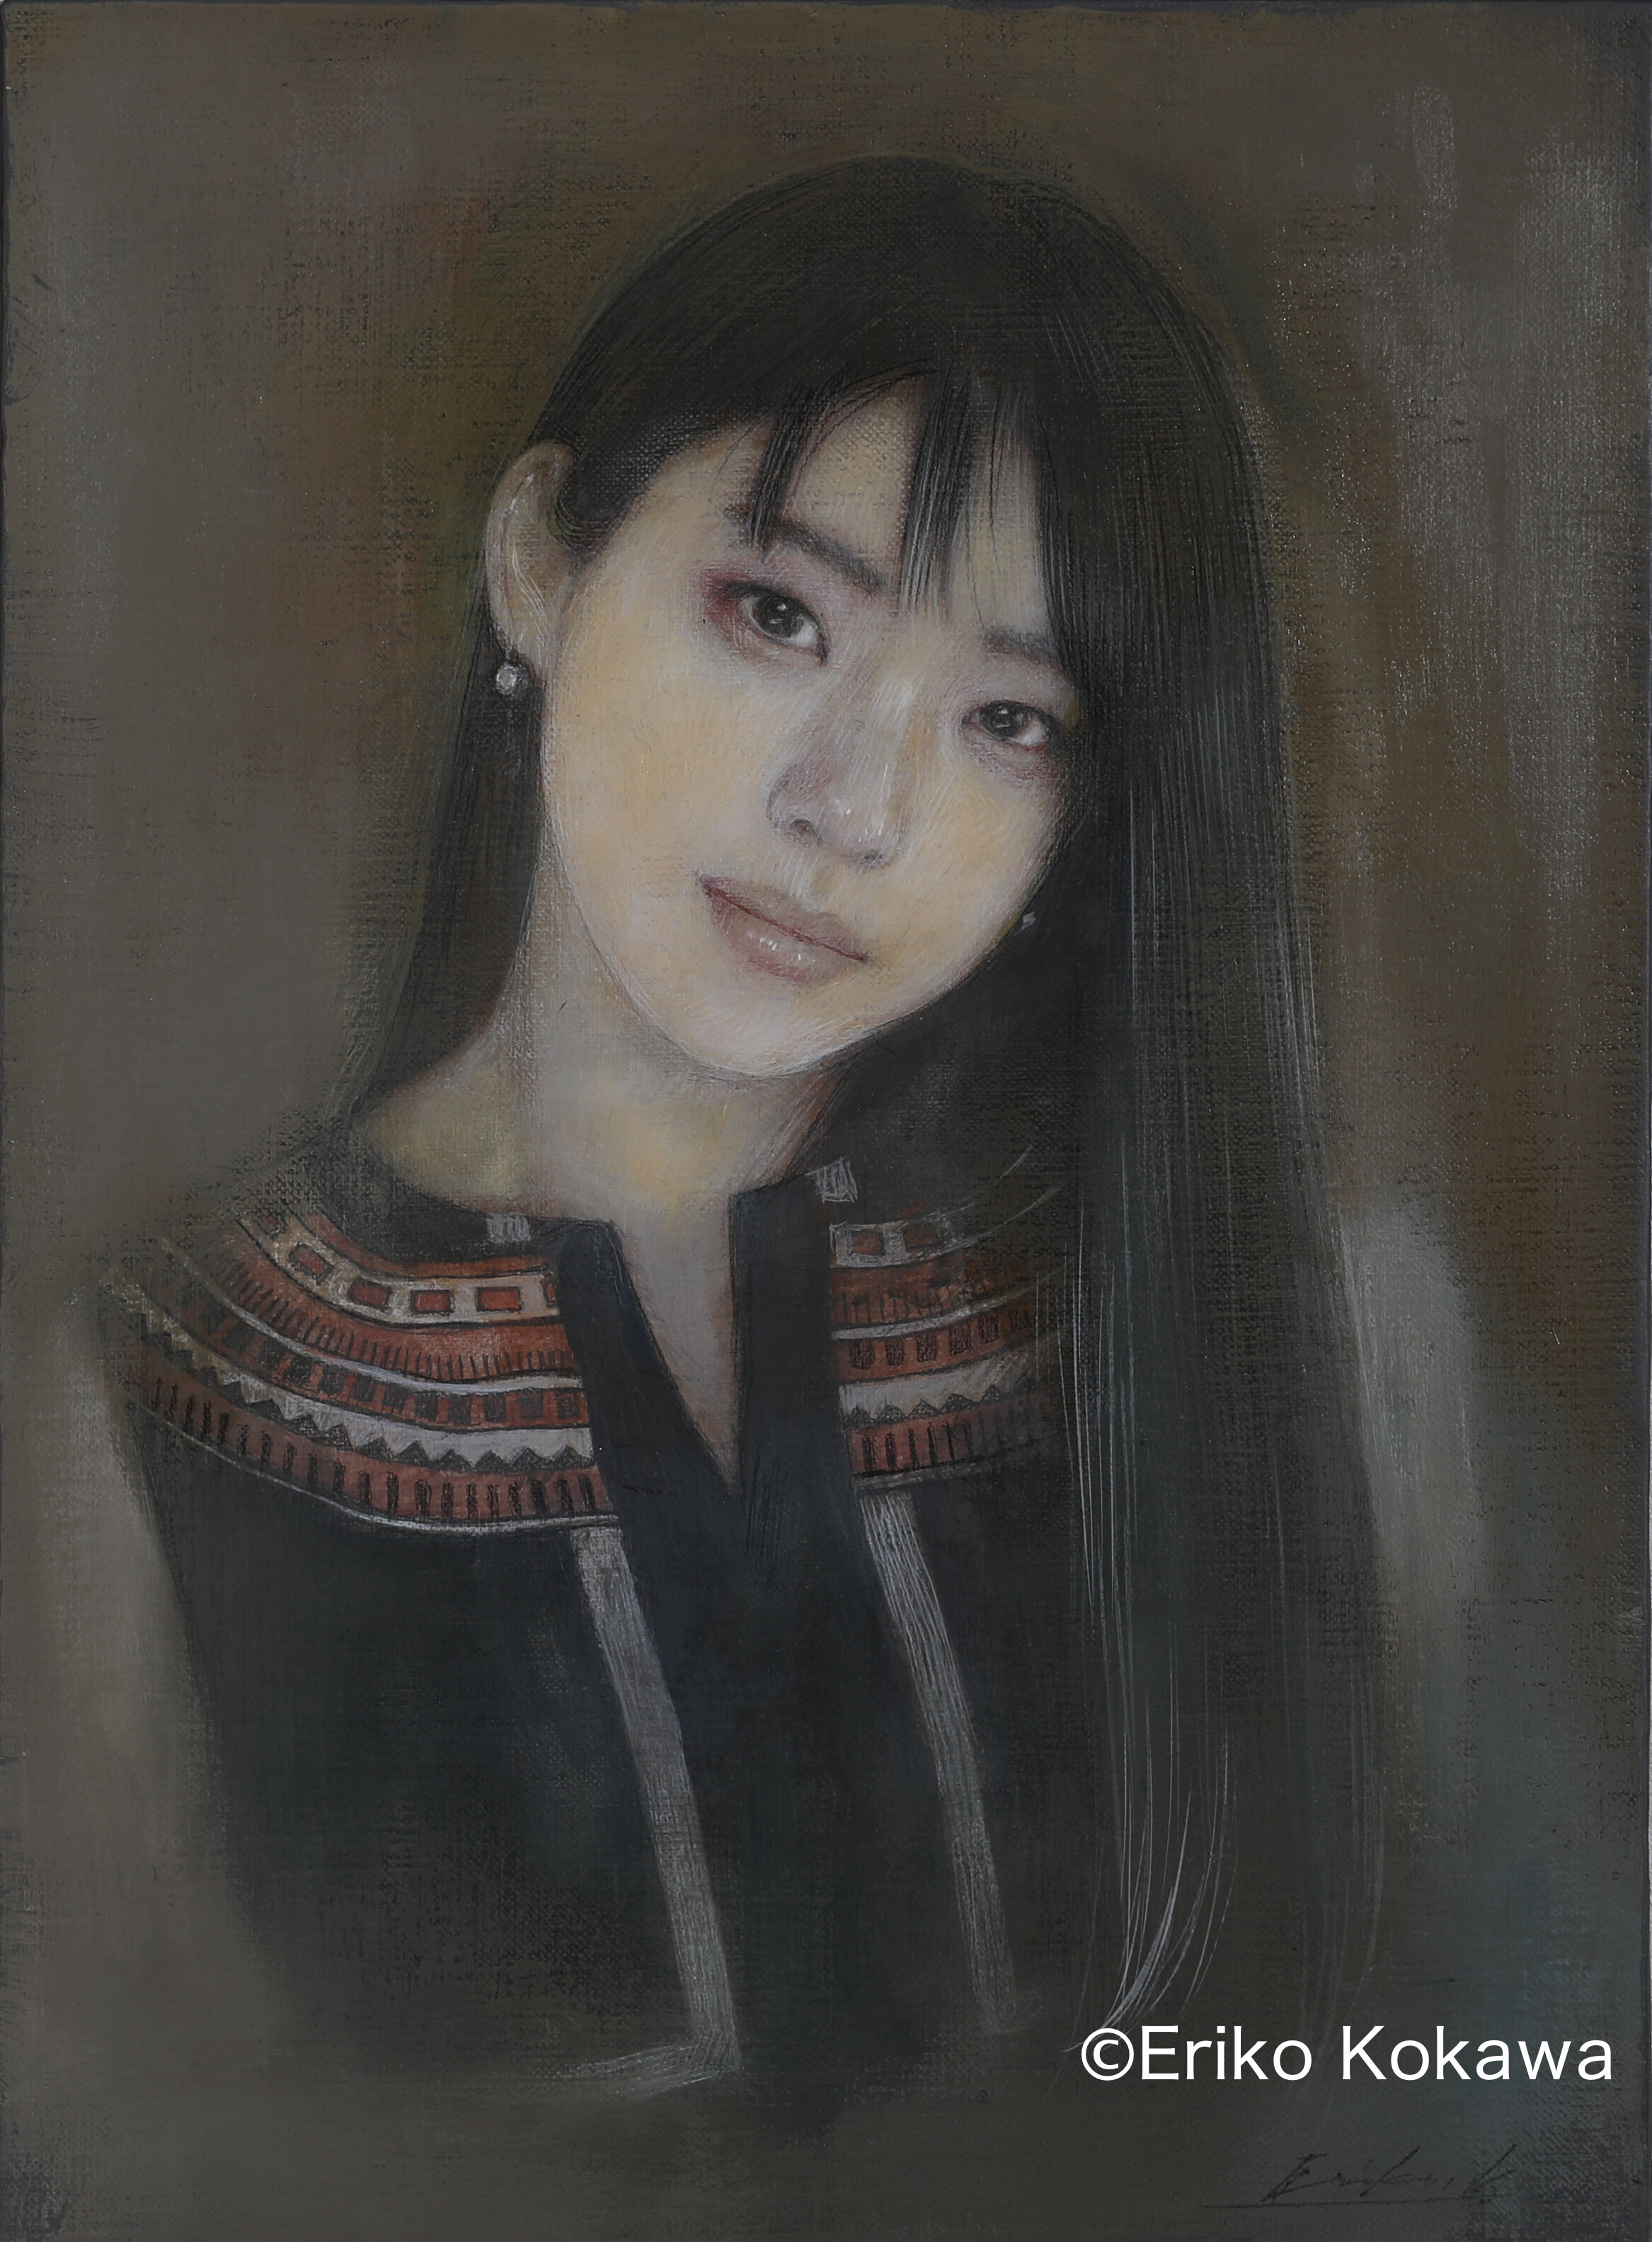 Eriko Kokawa_Distant memory.JPG